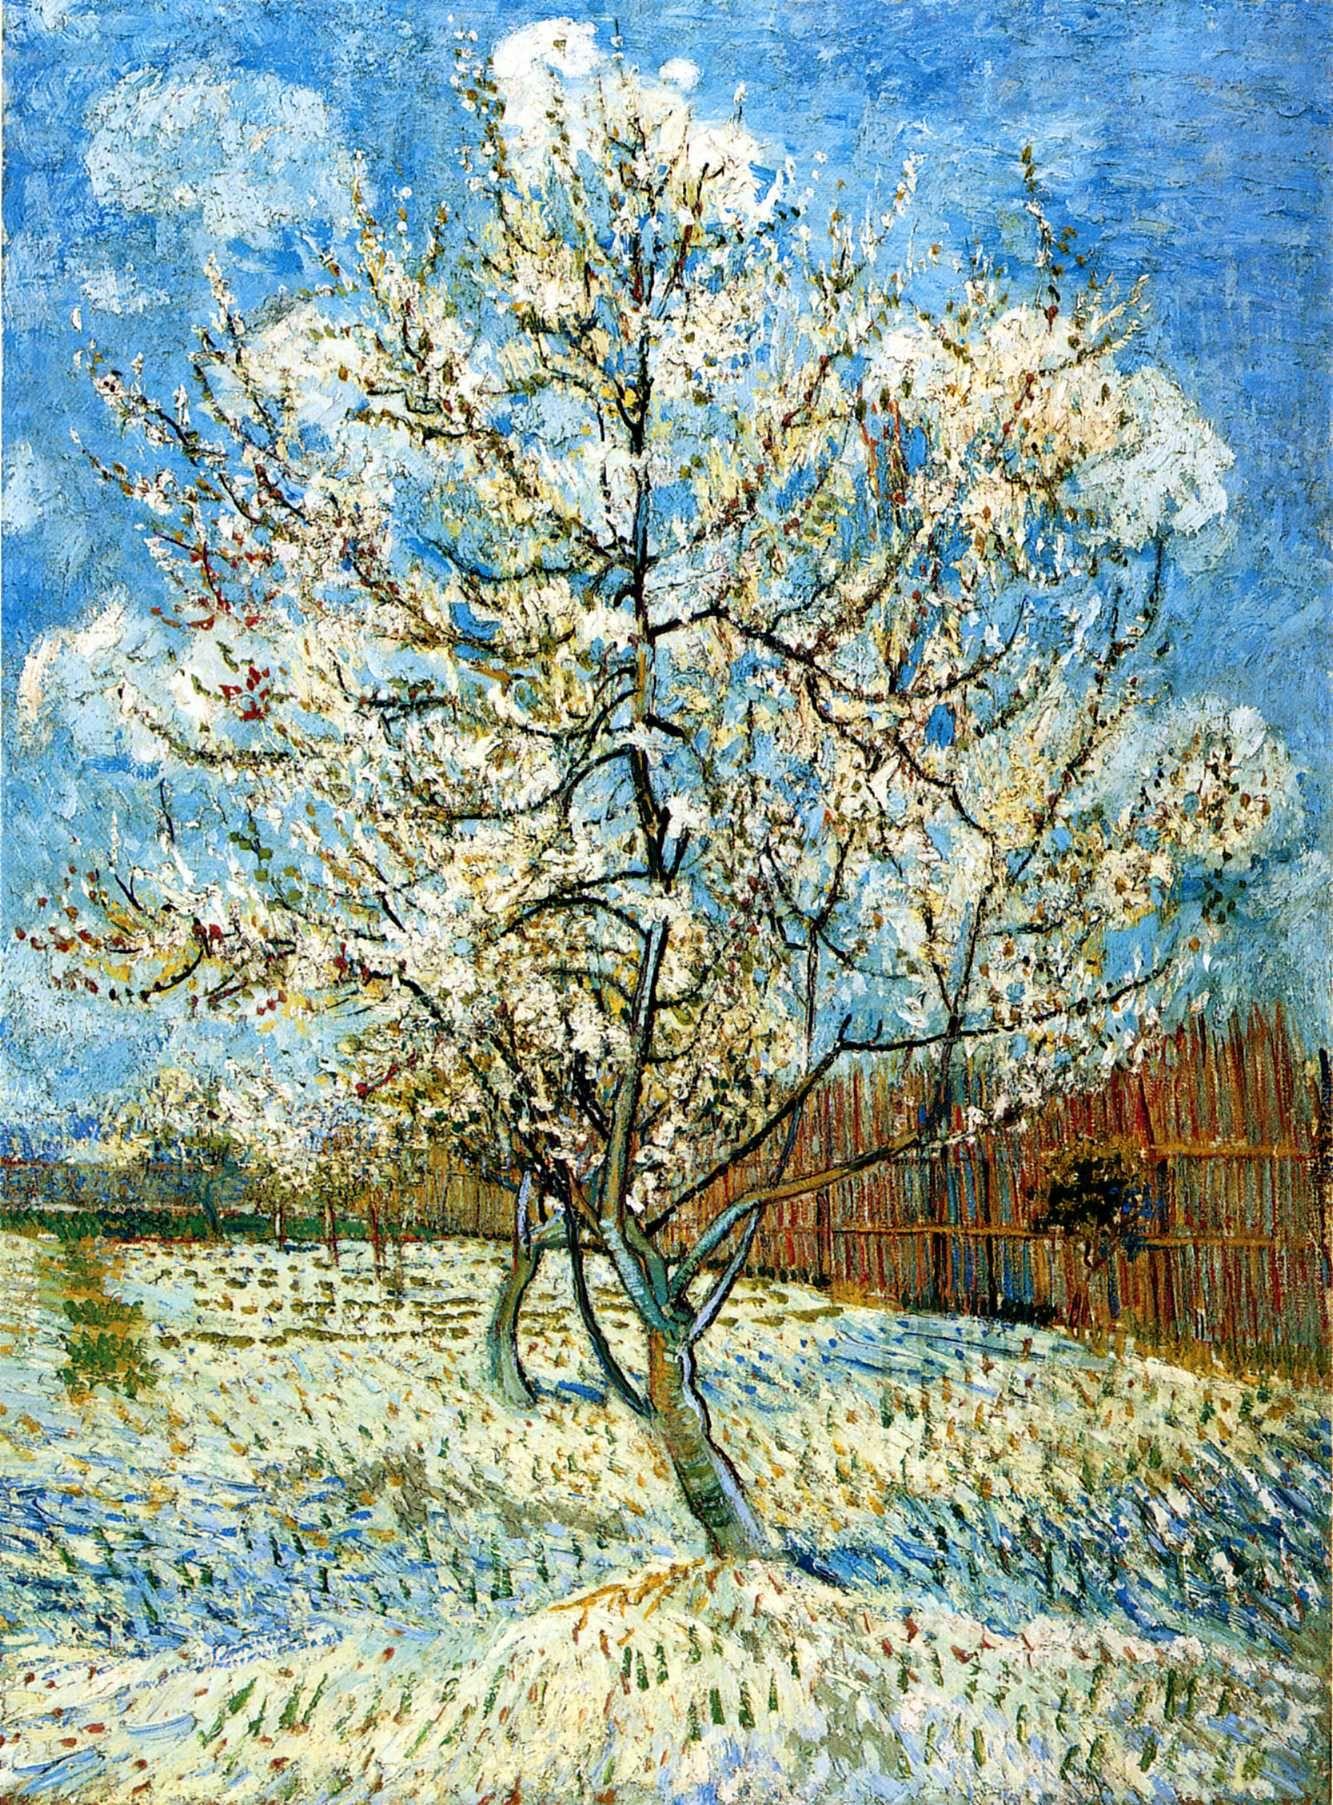 Peach Trees In Blossom Vincent Van Gogh Fecha 1888 Arles Bouches Du Rhone France Estilo Posimpre Cuadros De Van Gogh Pinturas De Van Gogh Pintor Van Gogh